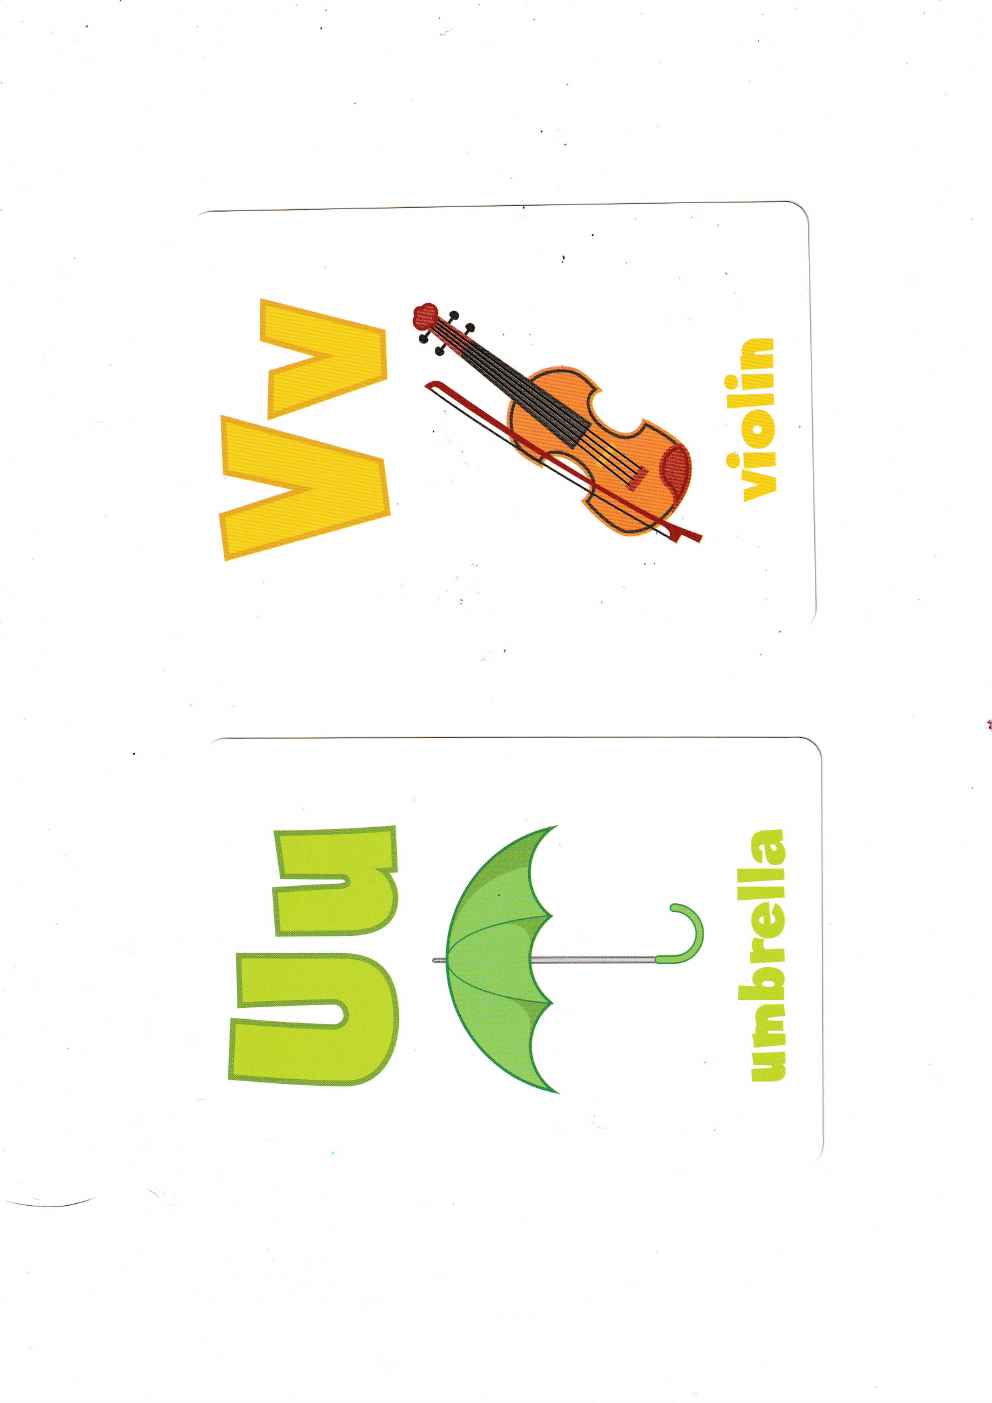 alphabet preschool worksheets alphabet preschool activities alphabet preschool printables alphabet preschool games